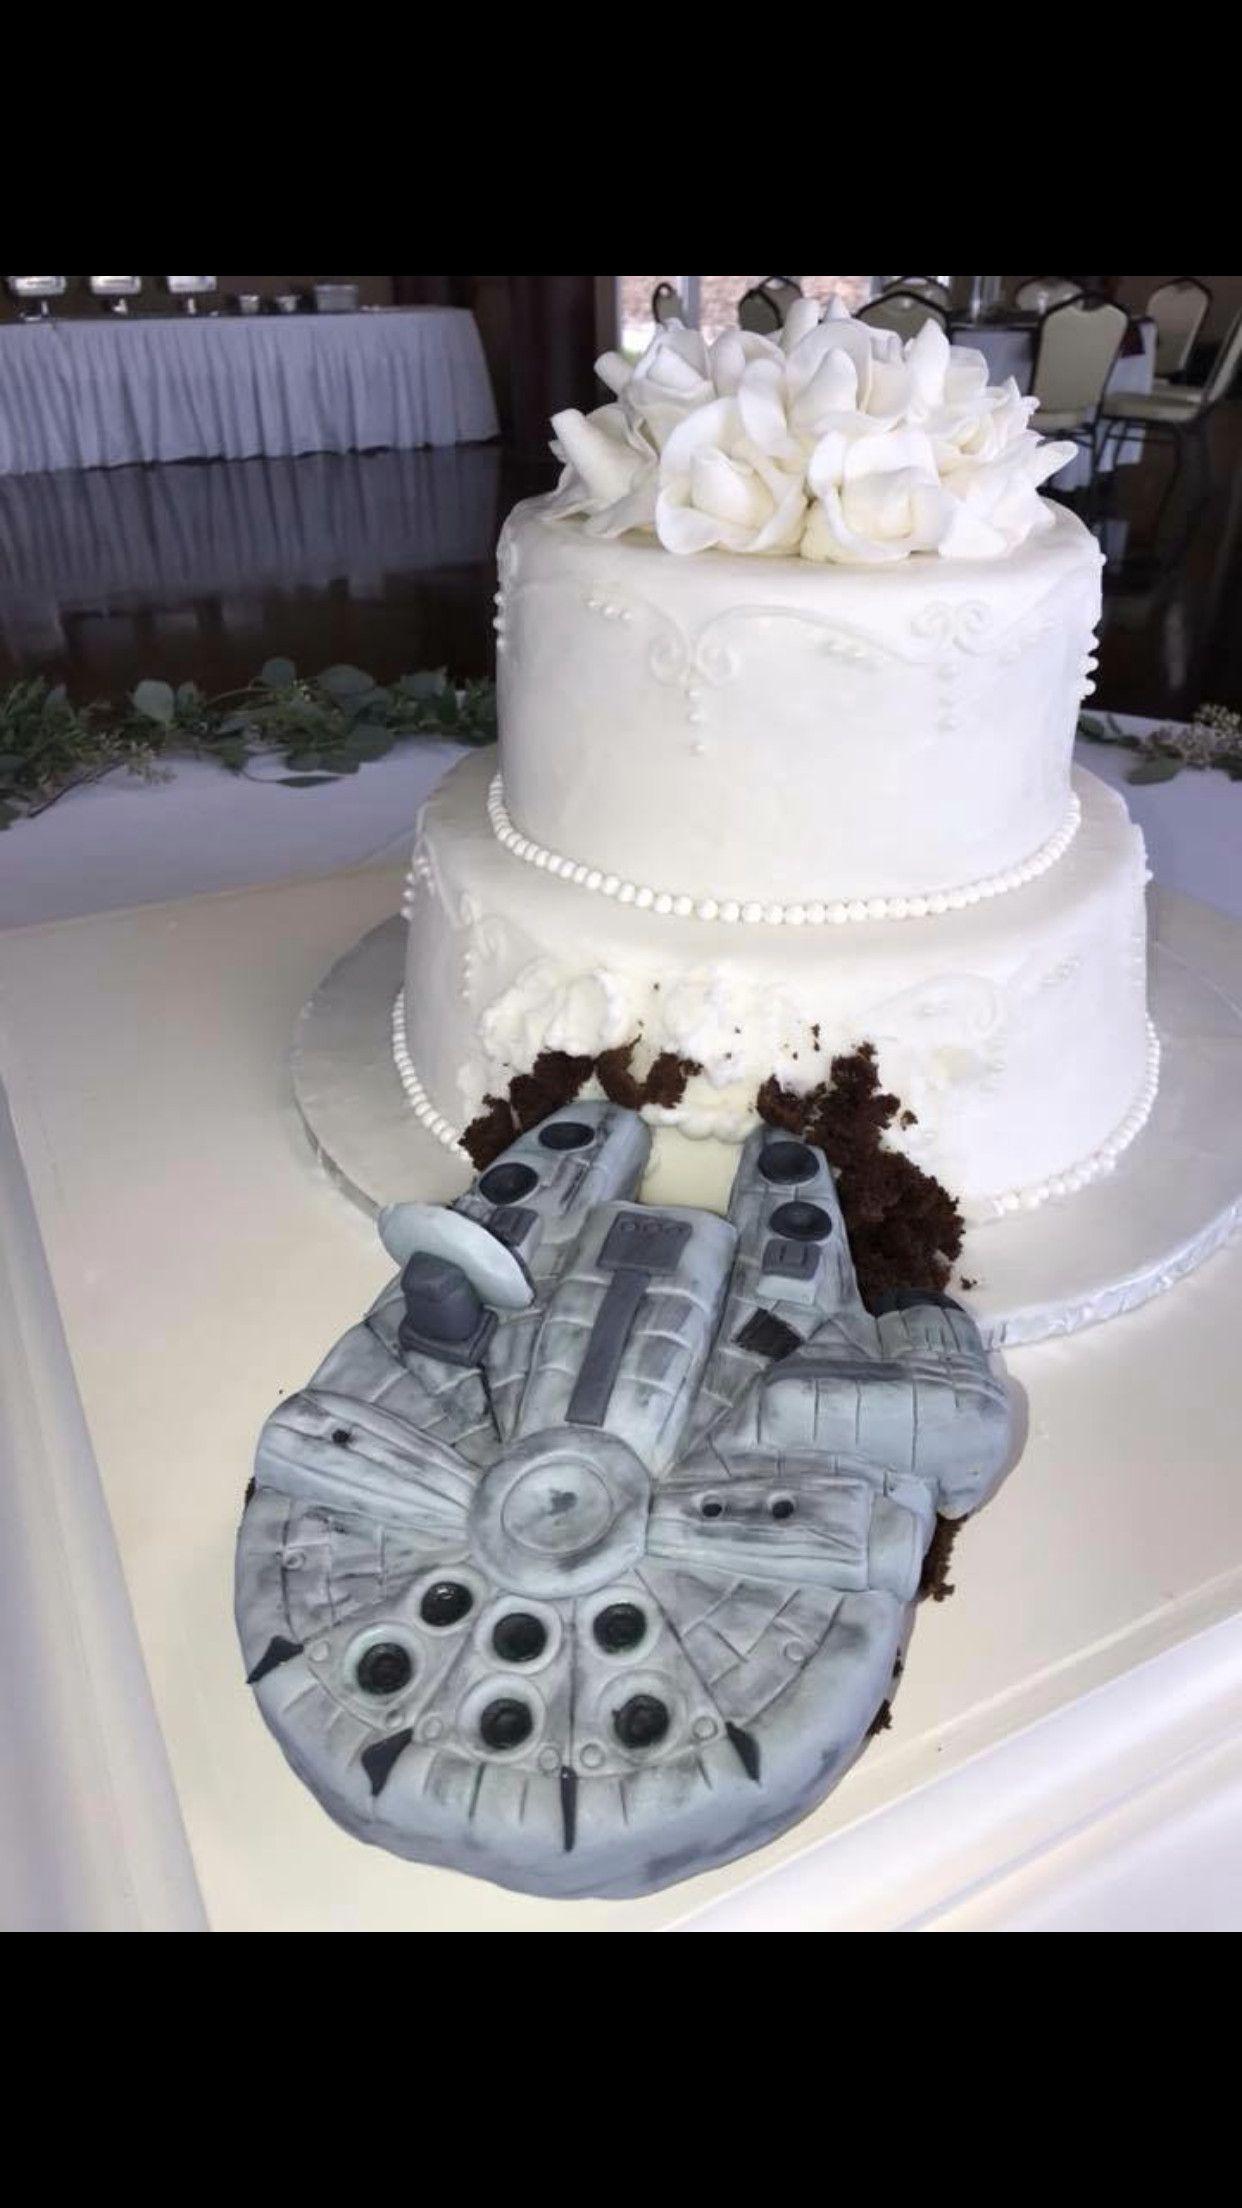 Star Wars Wedding Cakes Type Millennium Falcon Star Wars Ship